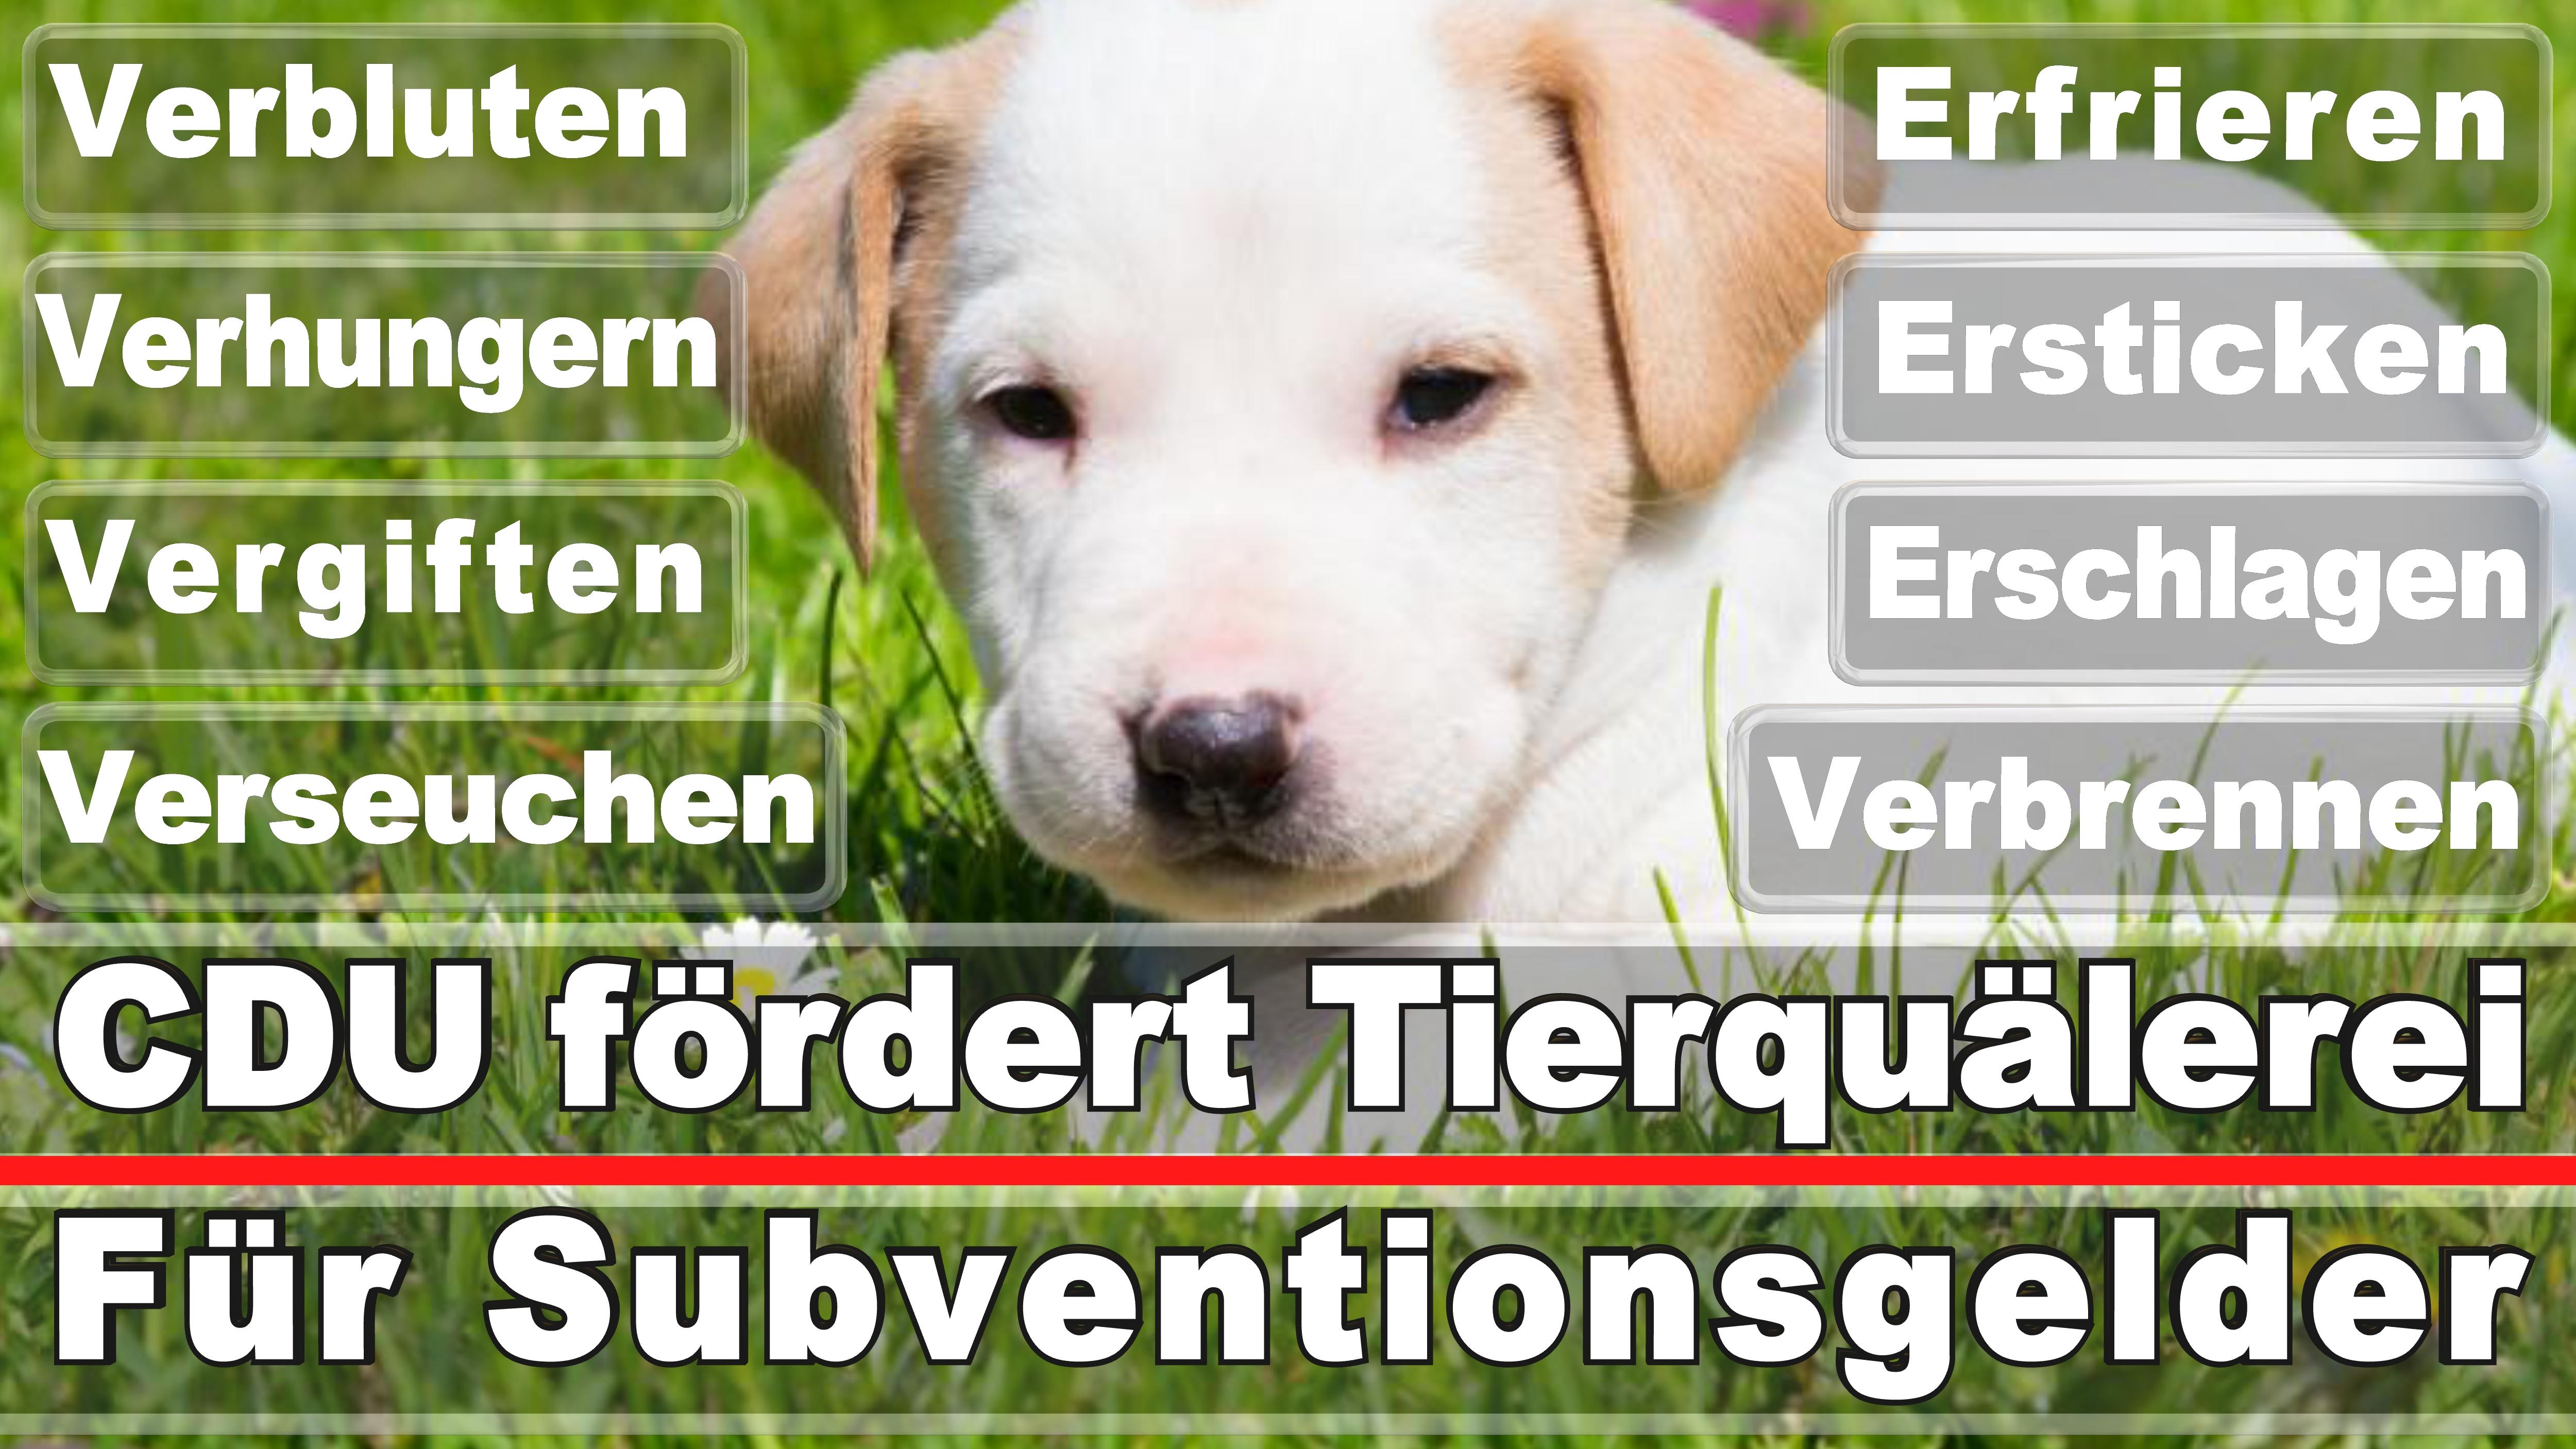 Landtagswahl-Bundestagswahl-CDU-SPD-FDP-AFD-Linke-Piraten-Tierschutzpartei (47)